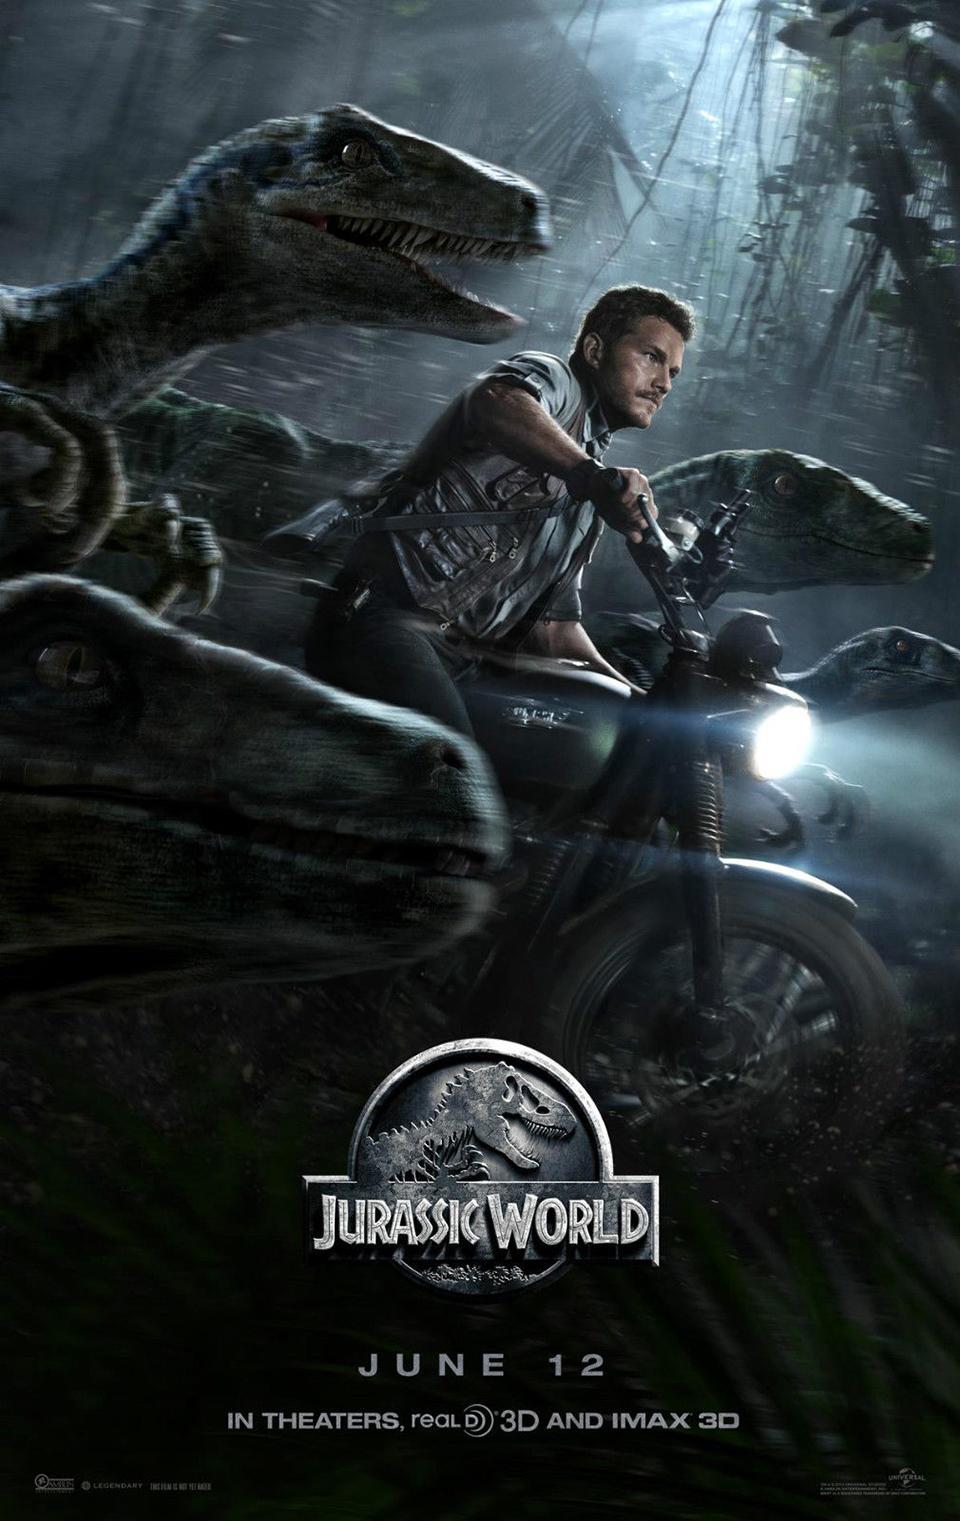 Jurassic World Triumph Scrambler